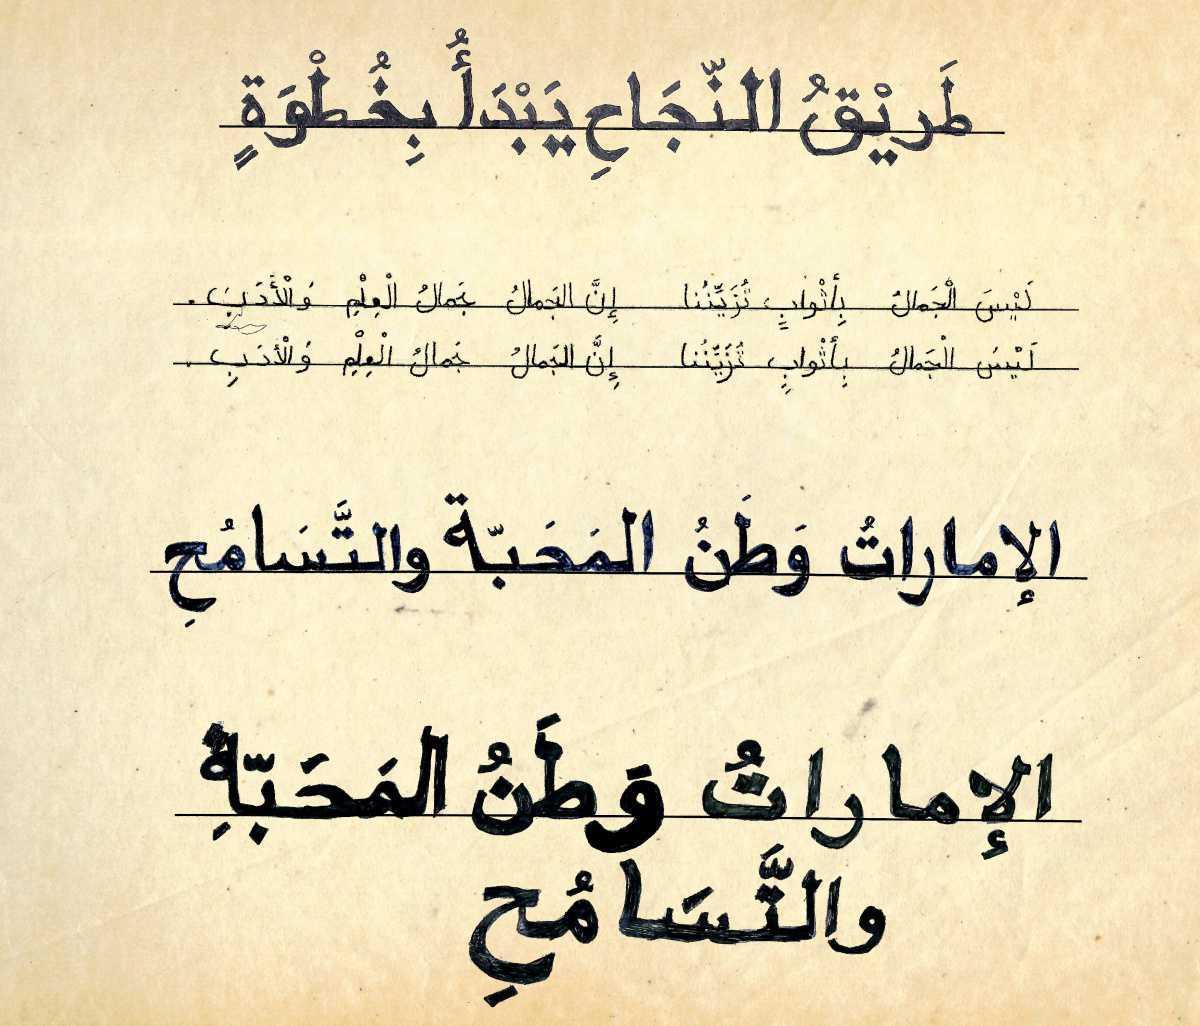 Concours de calligraphie arabe